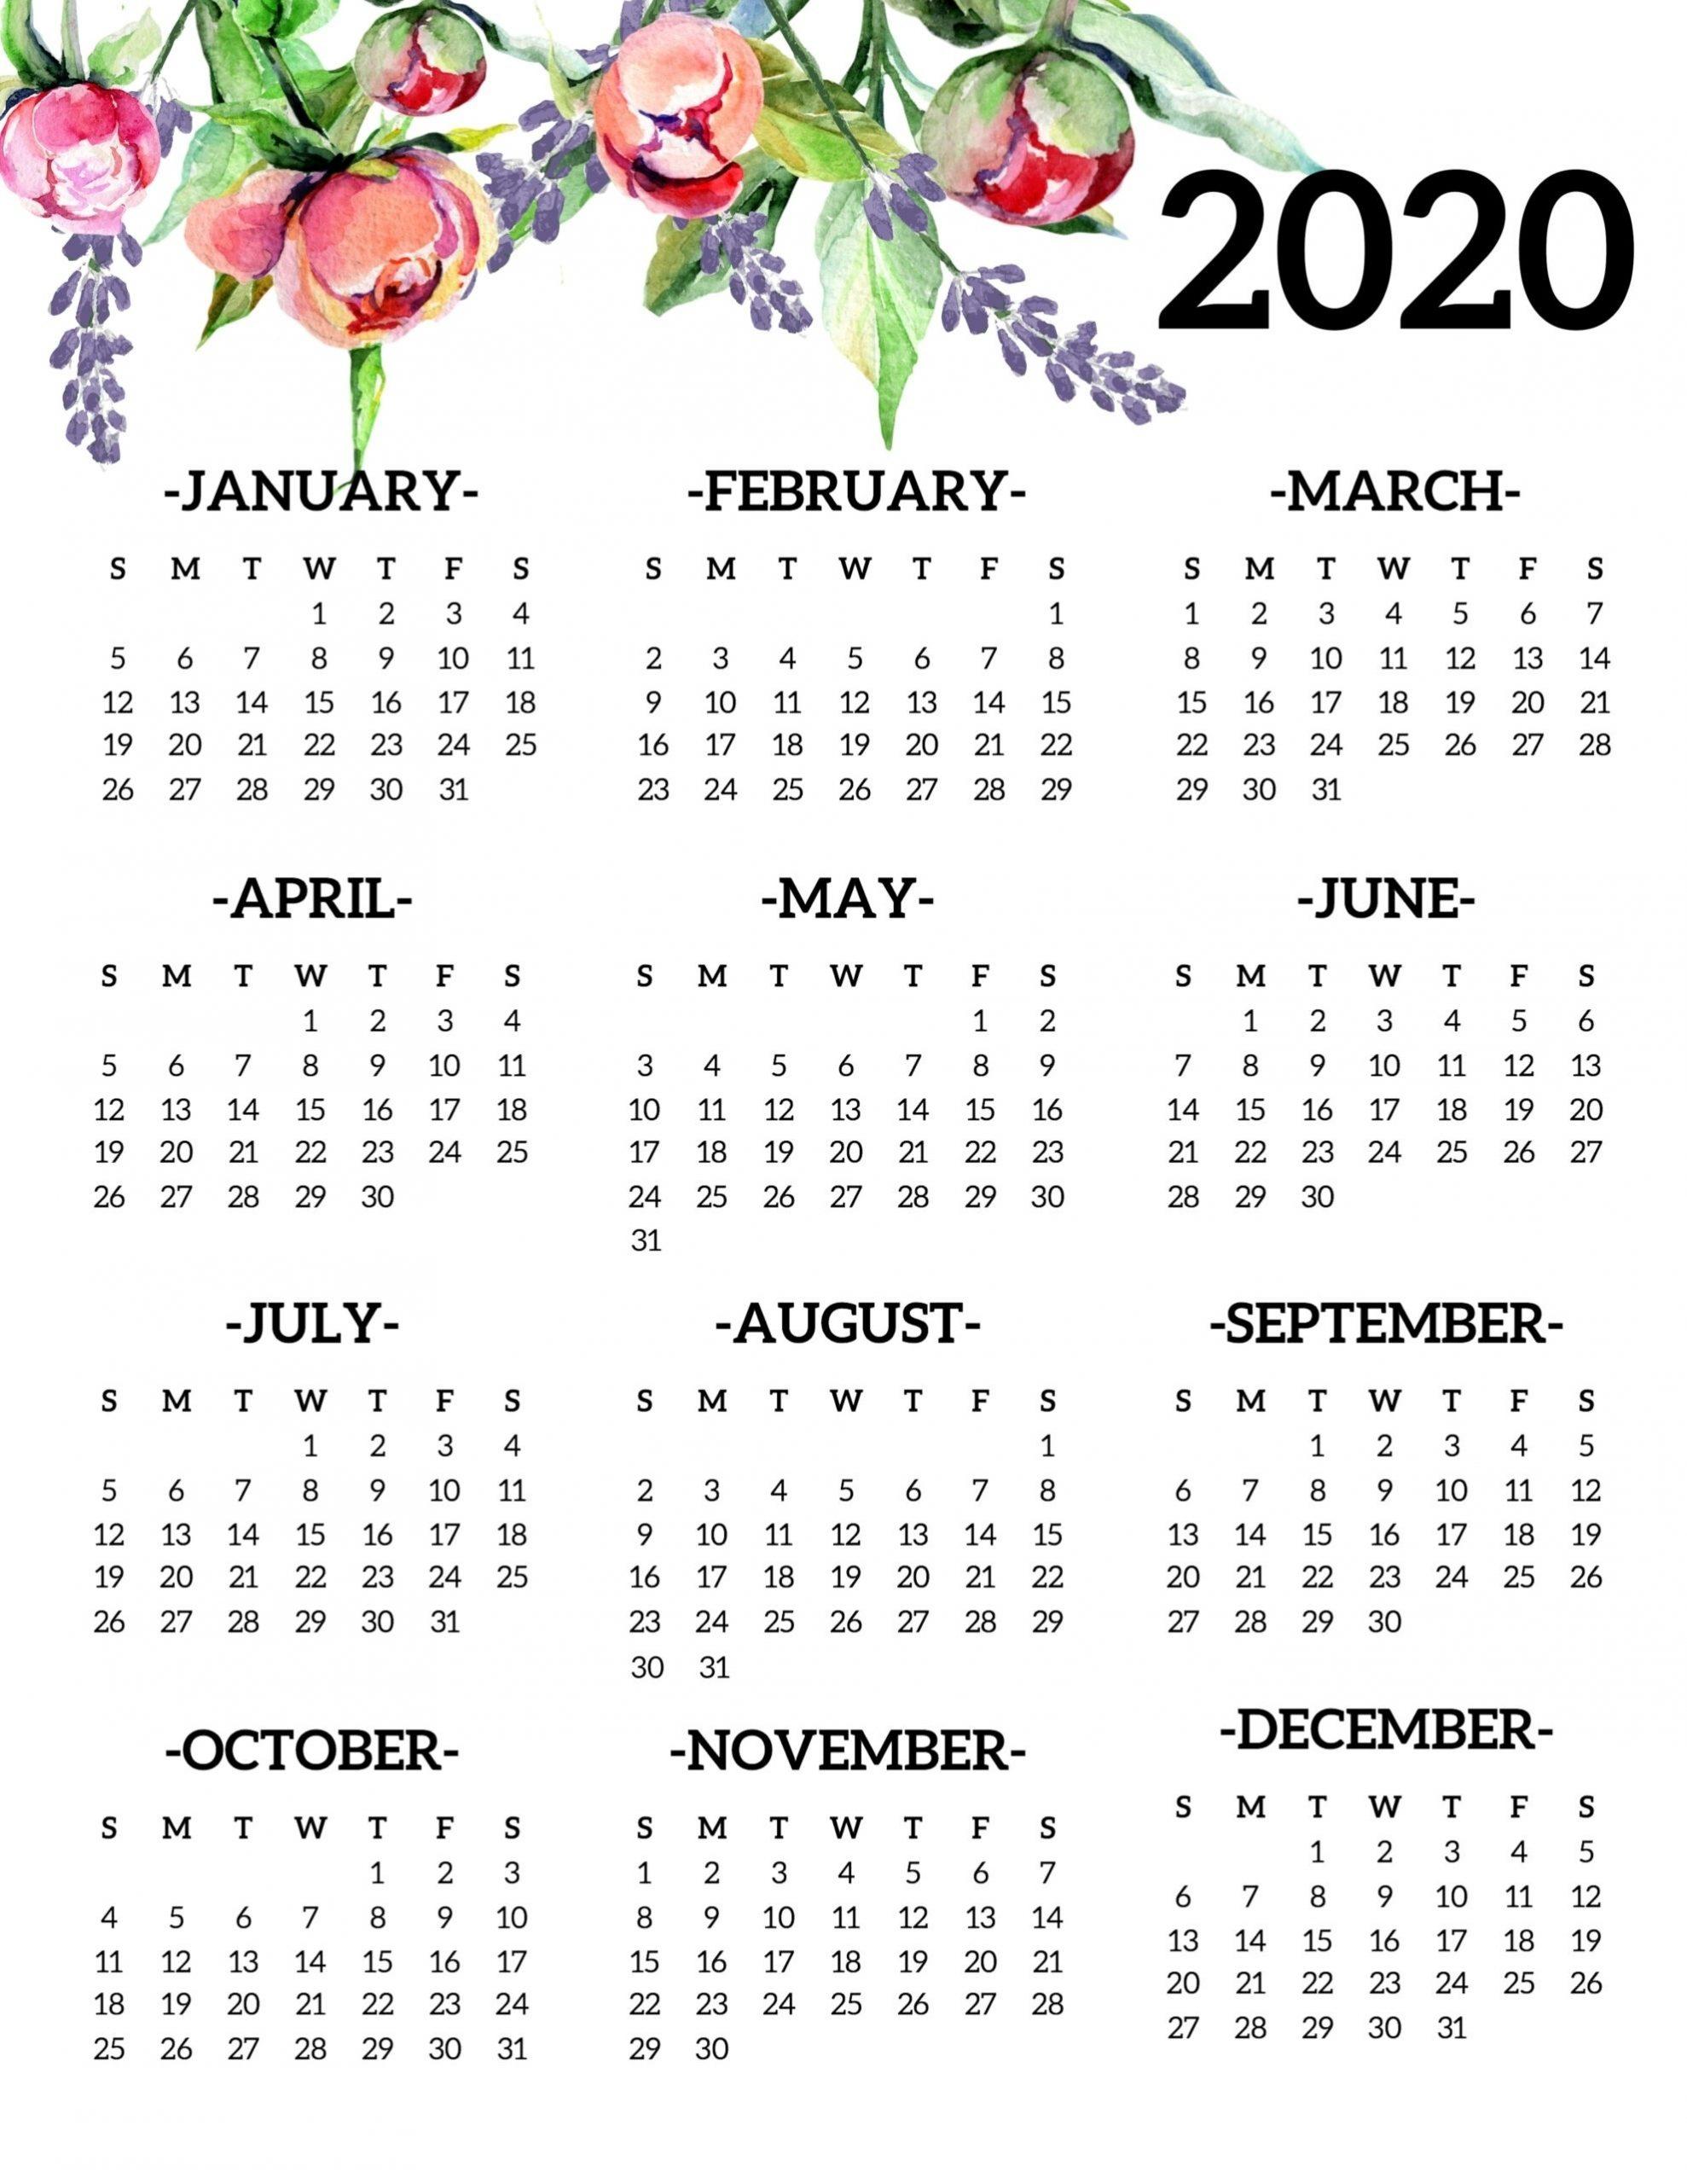 Depo Provera Calculator 2020 – Template Calendar Design